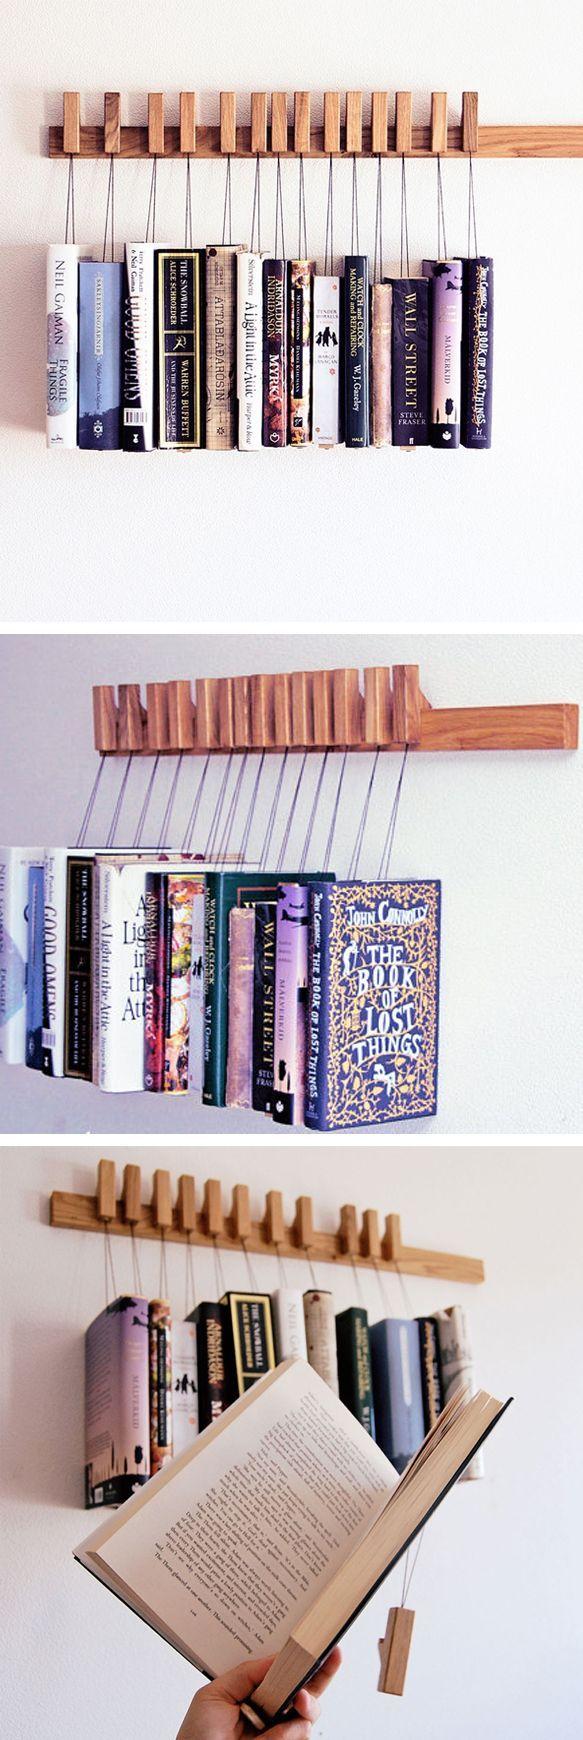 l 39 id e d co du samedi des livres suspendus floriane lemari woodworking artistry. Black Bedroom Furniture Sets. Home Design Ideas